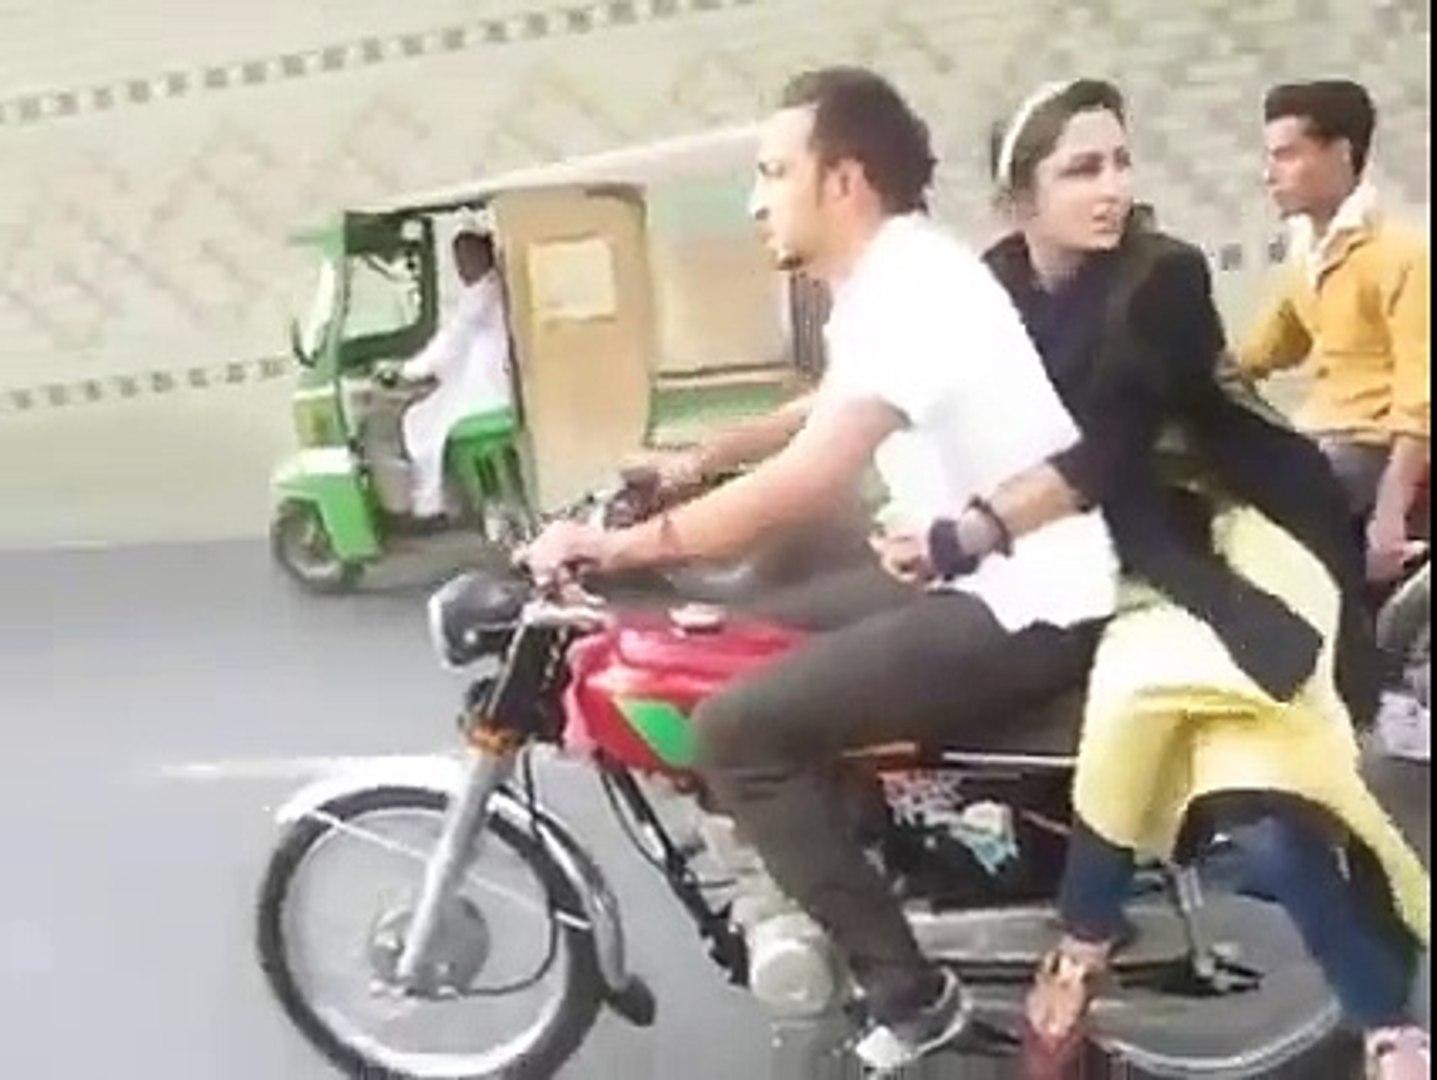 Girl and boy sitting on bike